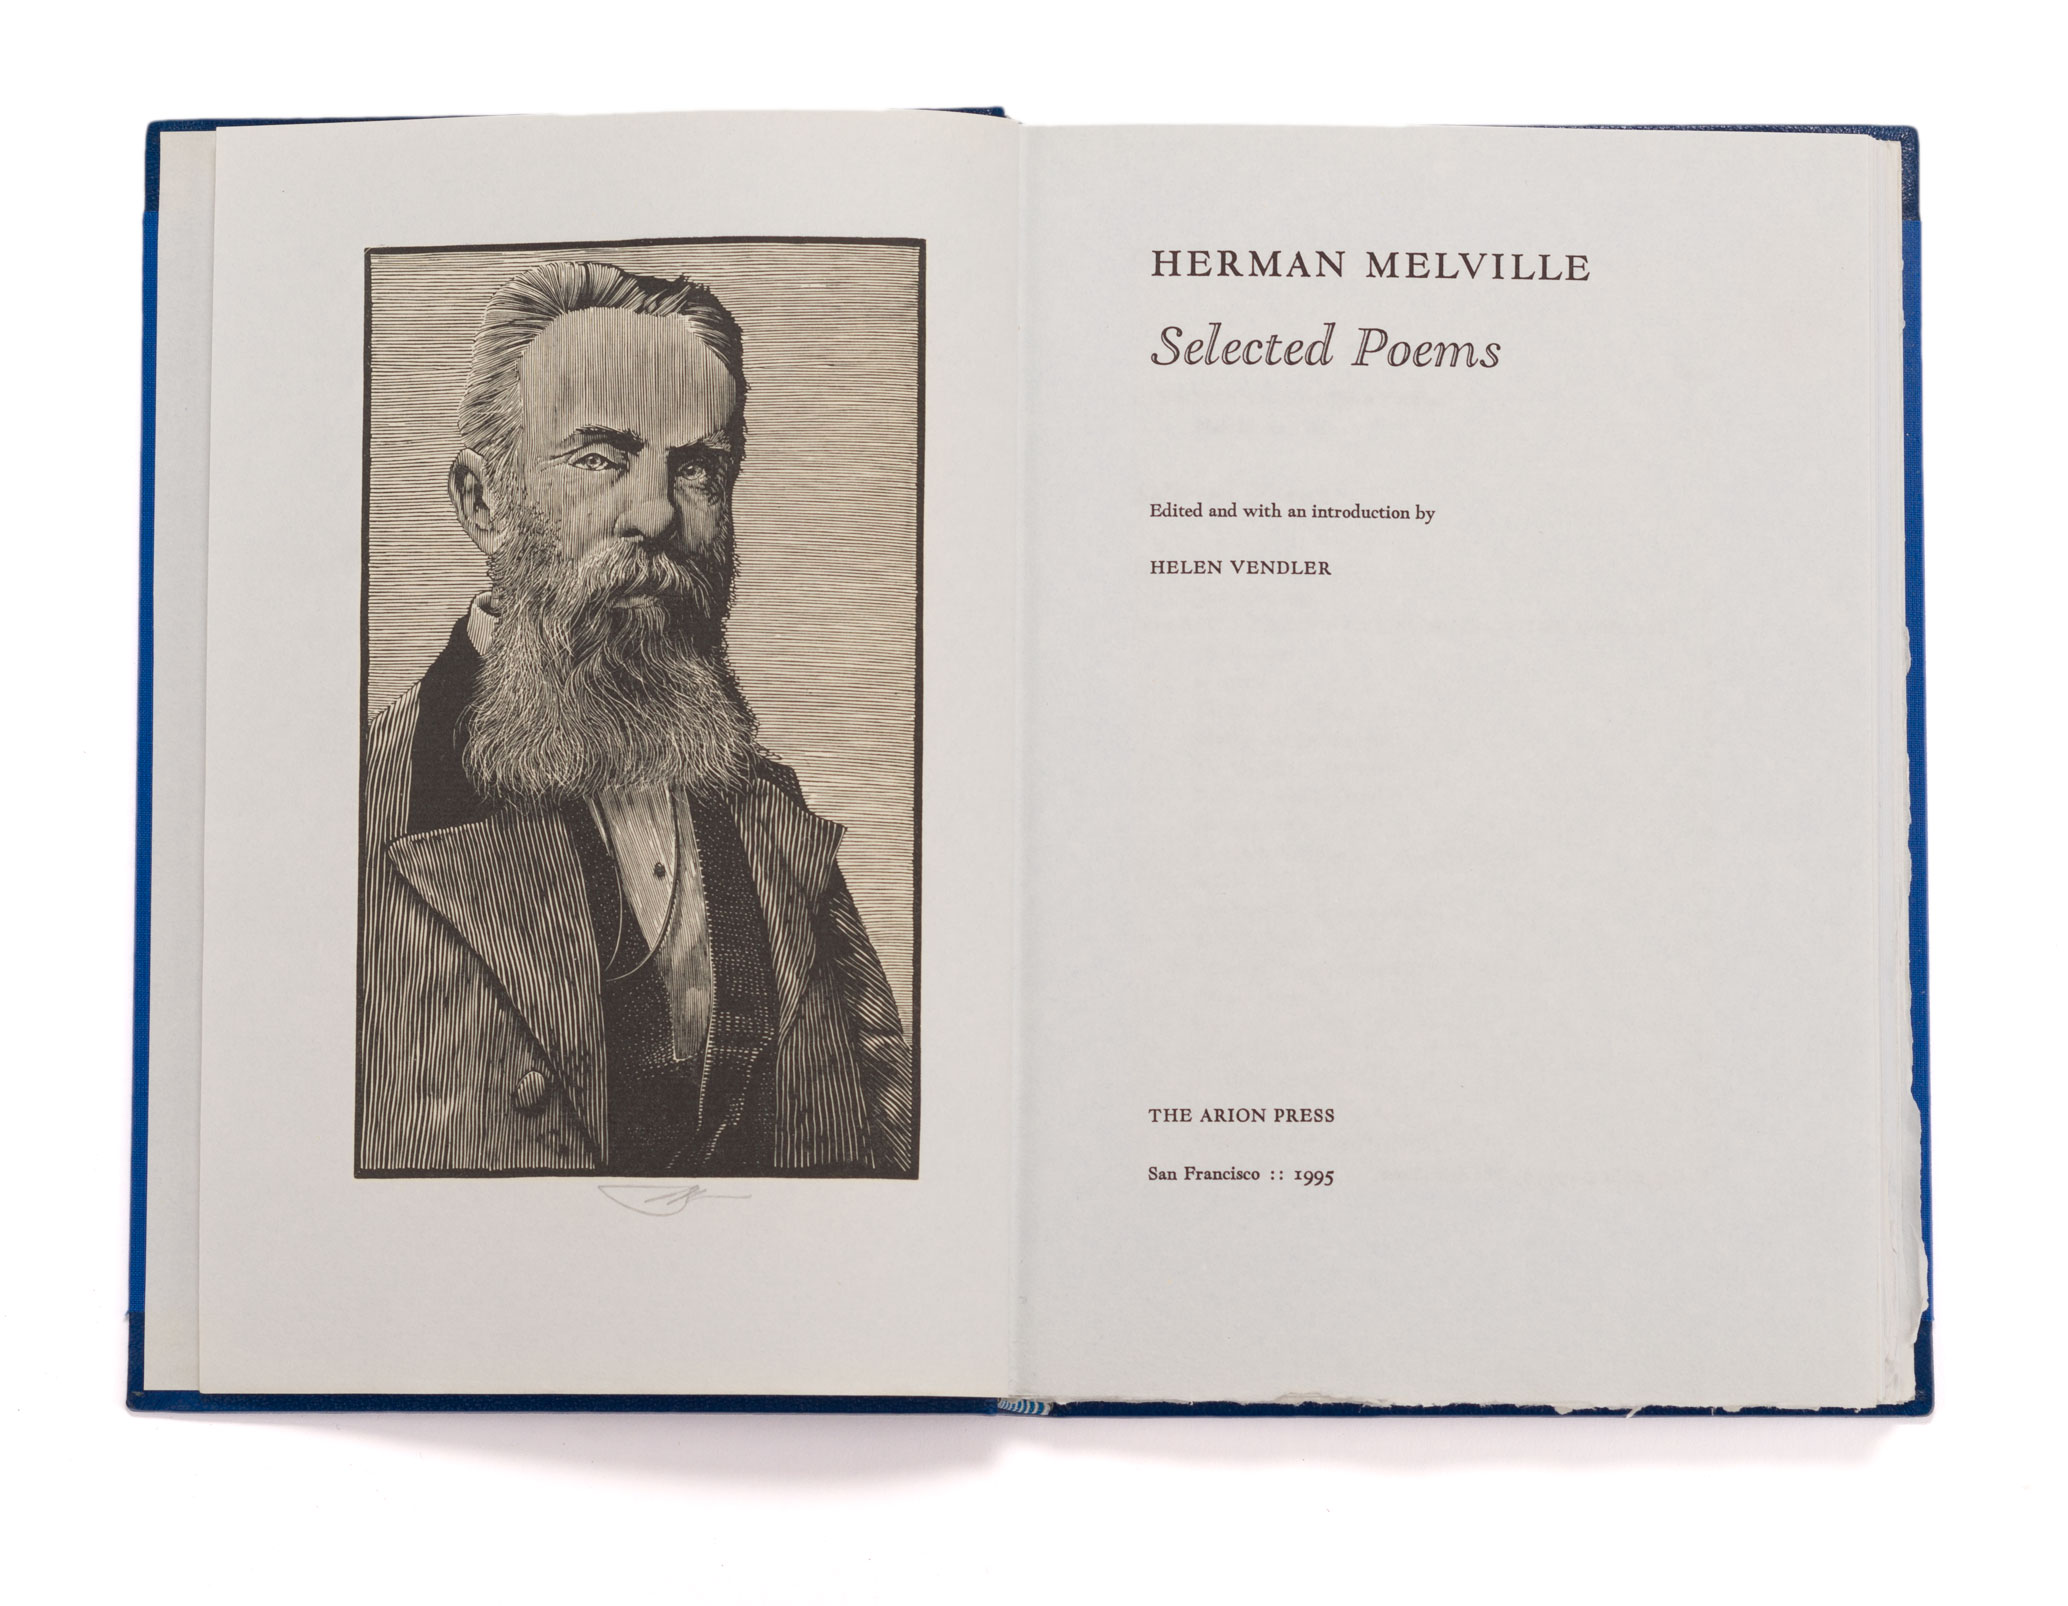 047_Herman-Melville-Poems.title.01.jpg